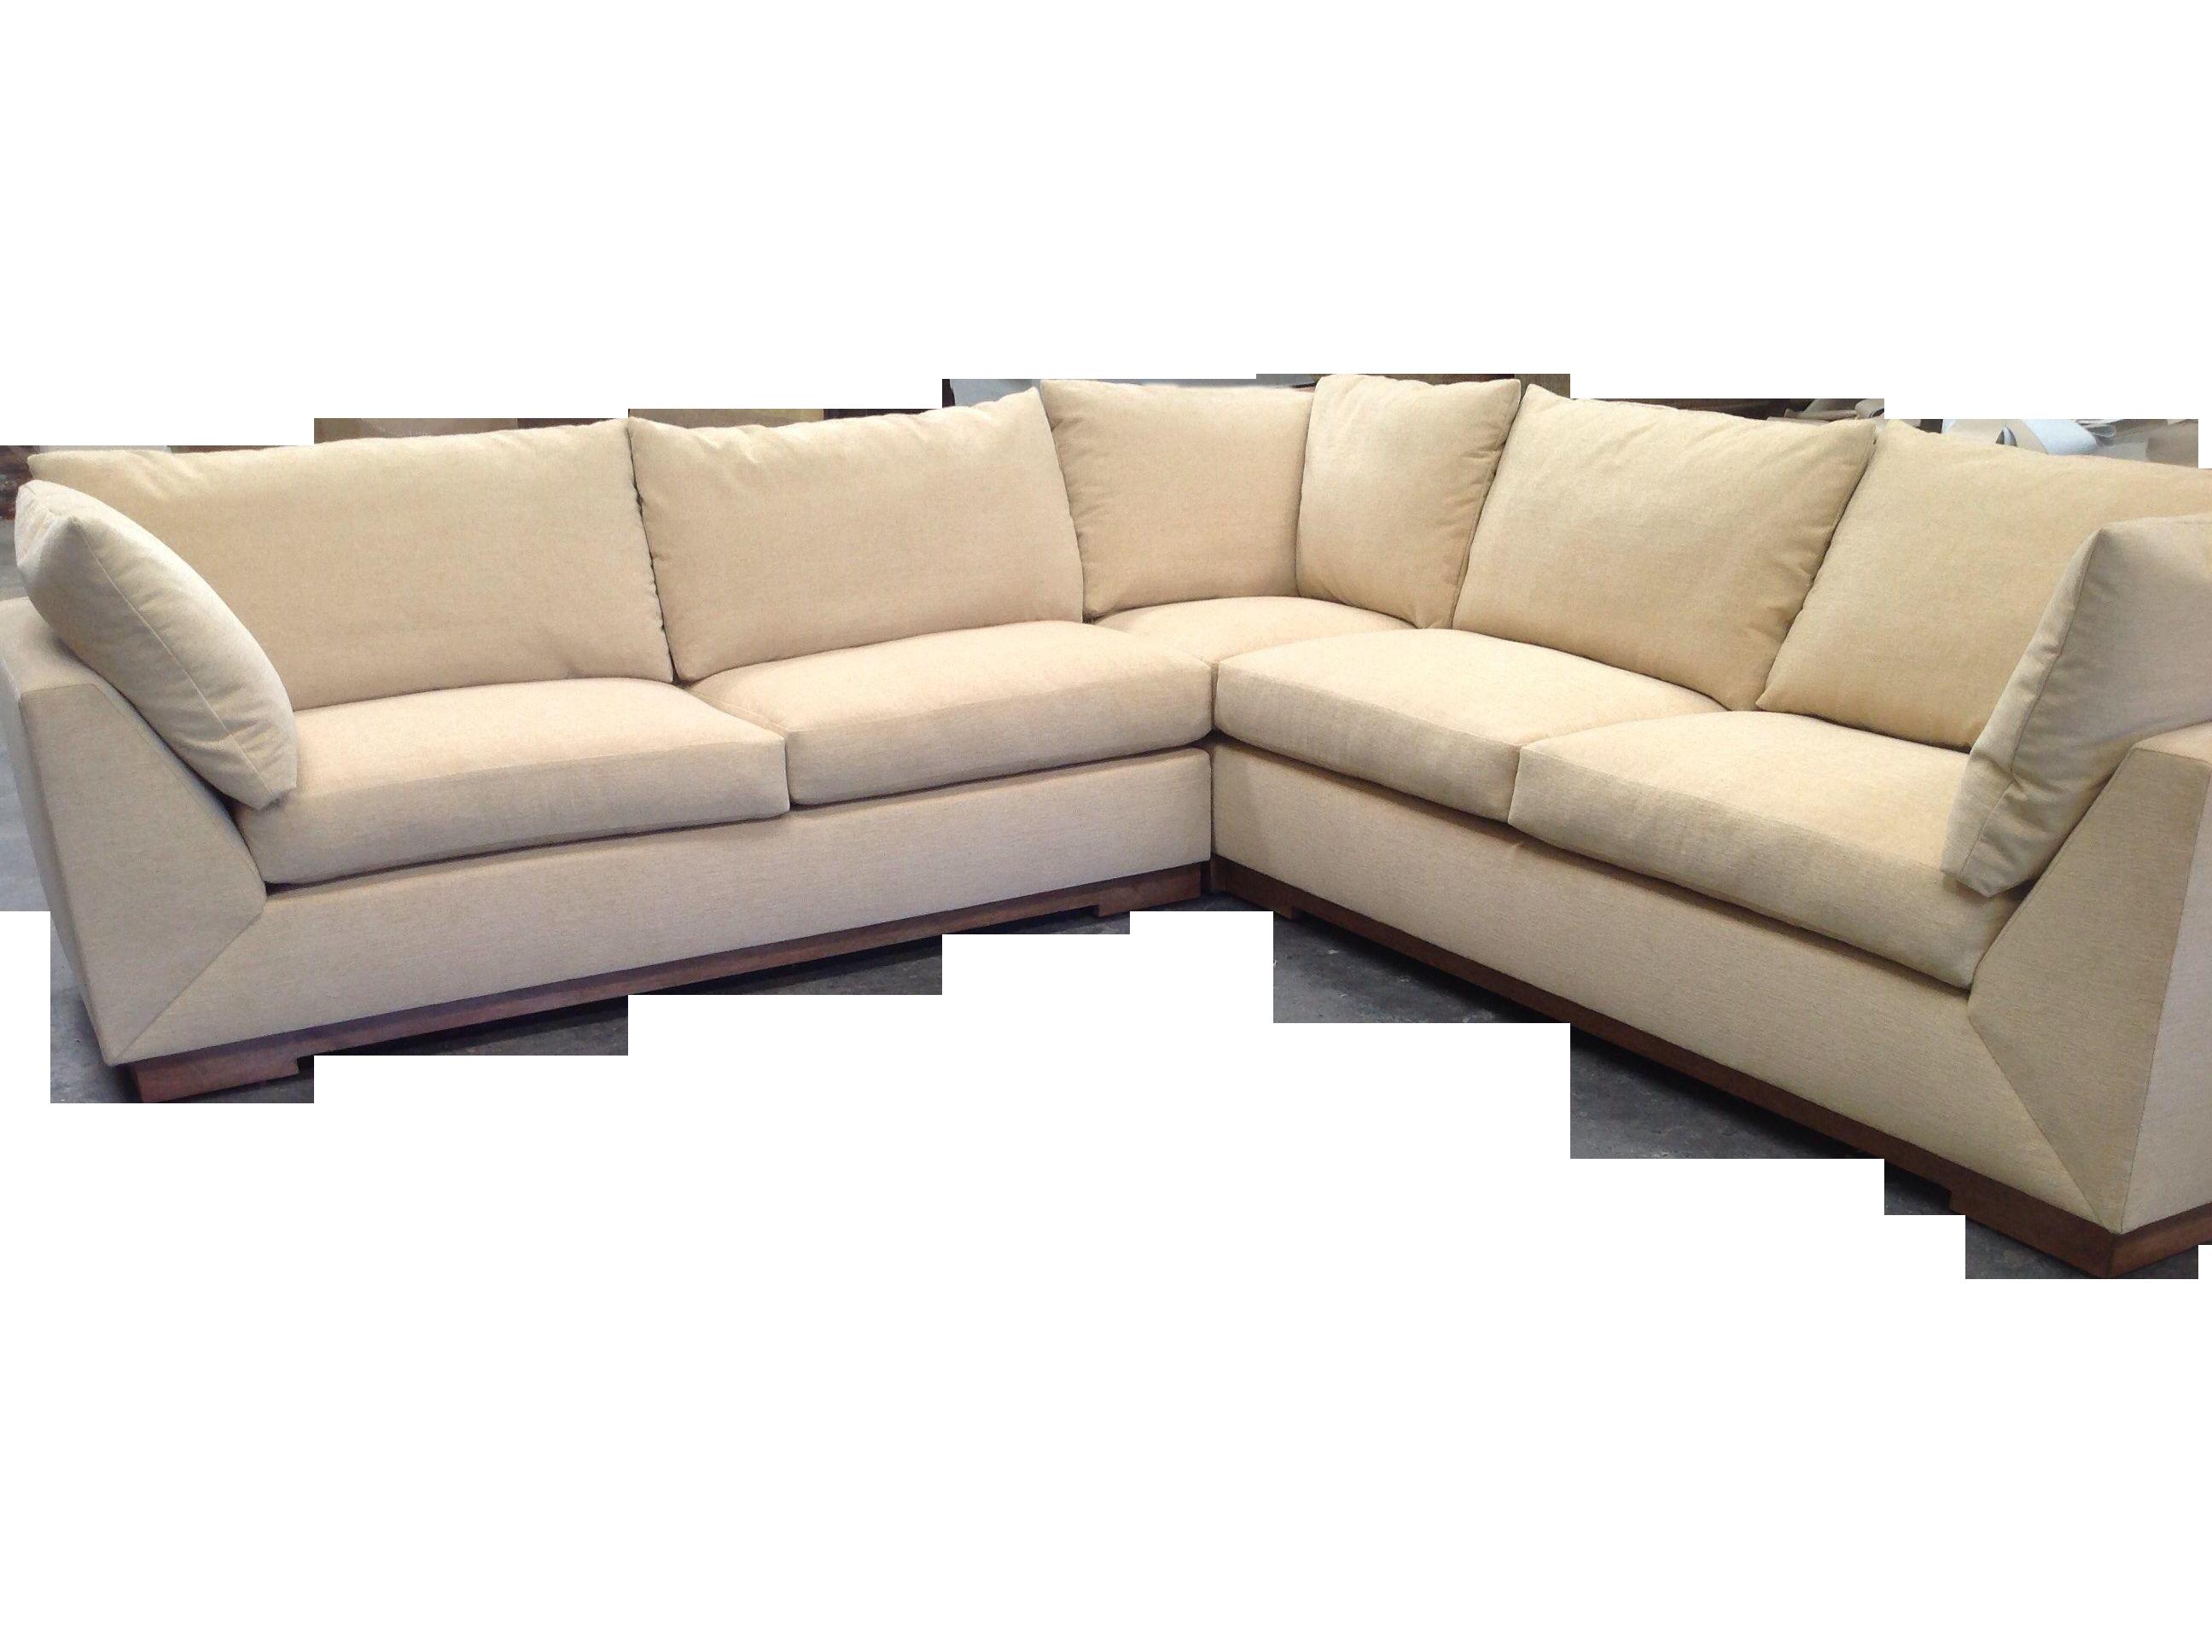 Kreiss Custom Panama Sectional Sofa Sectional Sofa Sofa